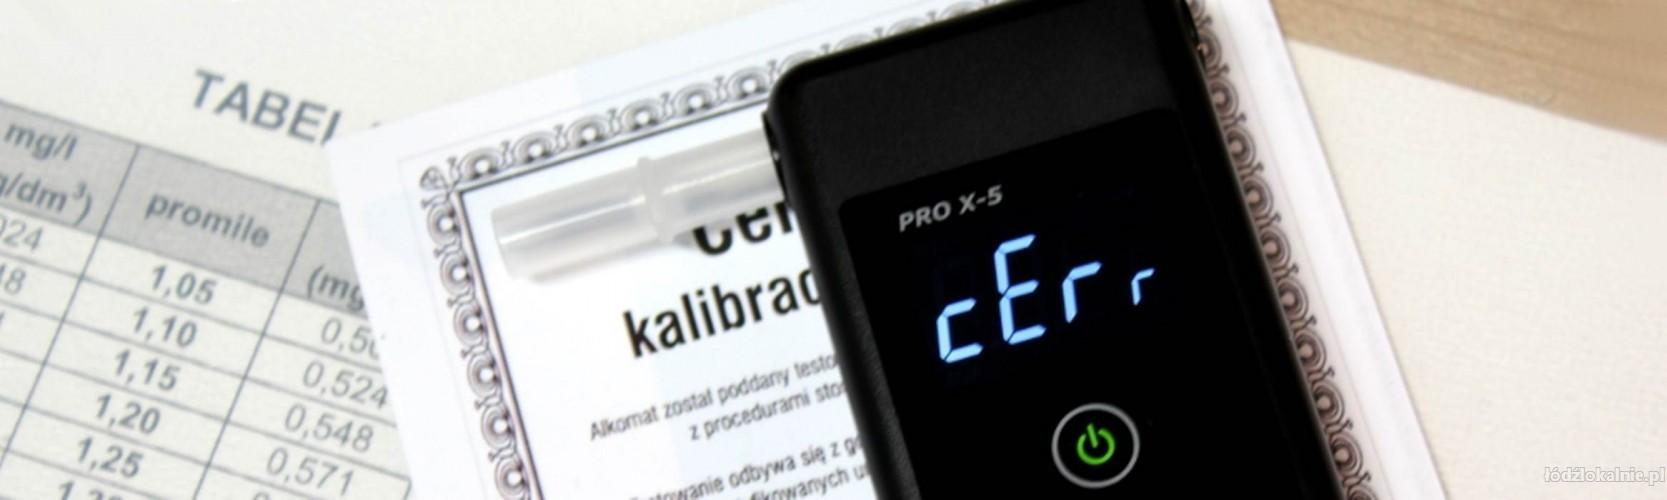 kalibracja alkomatu pro x-5 plus, legalizacja alkomatu